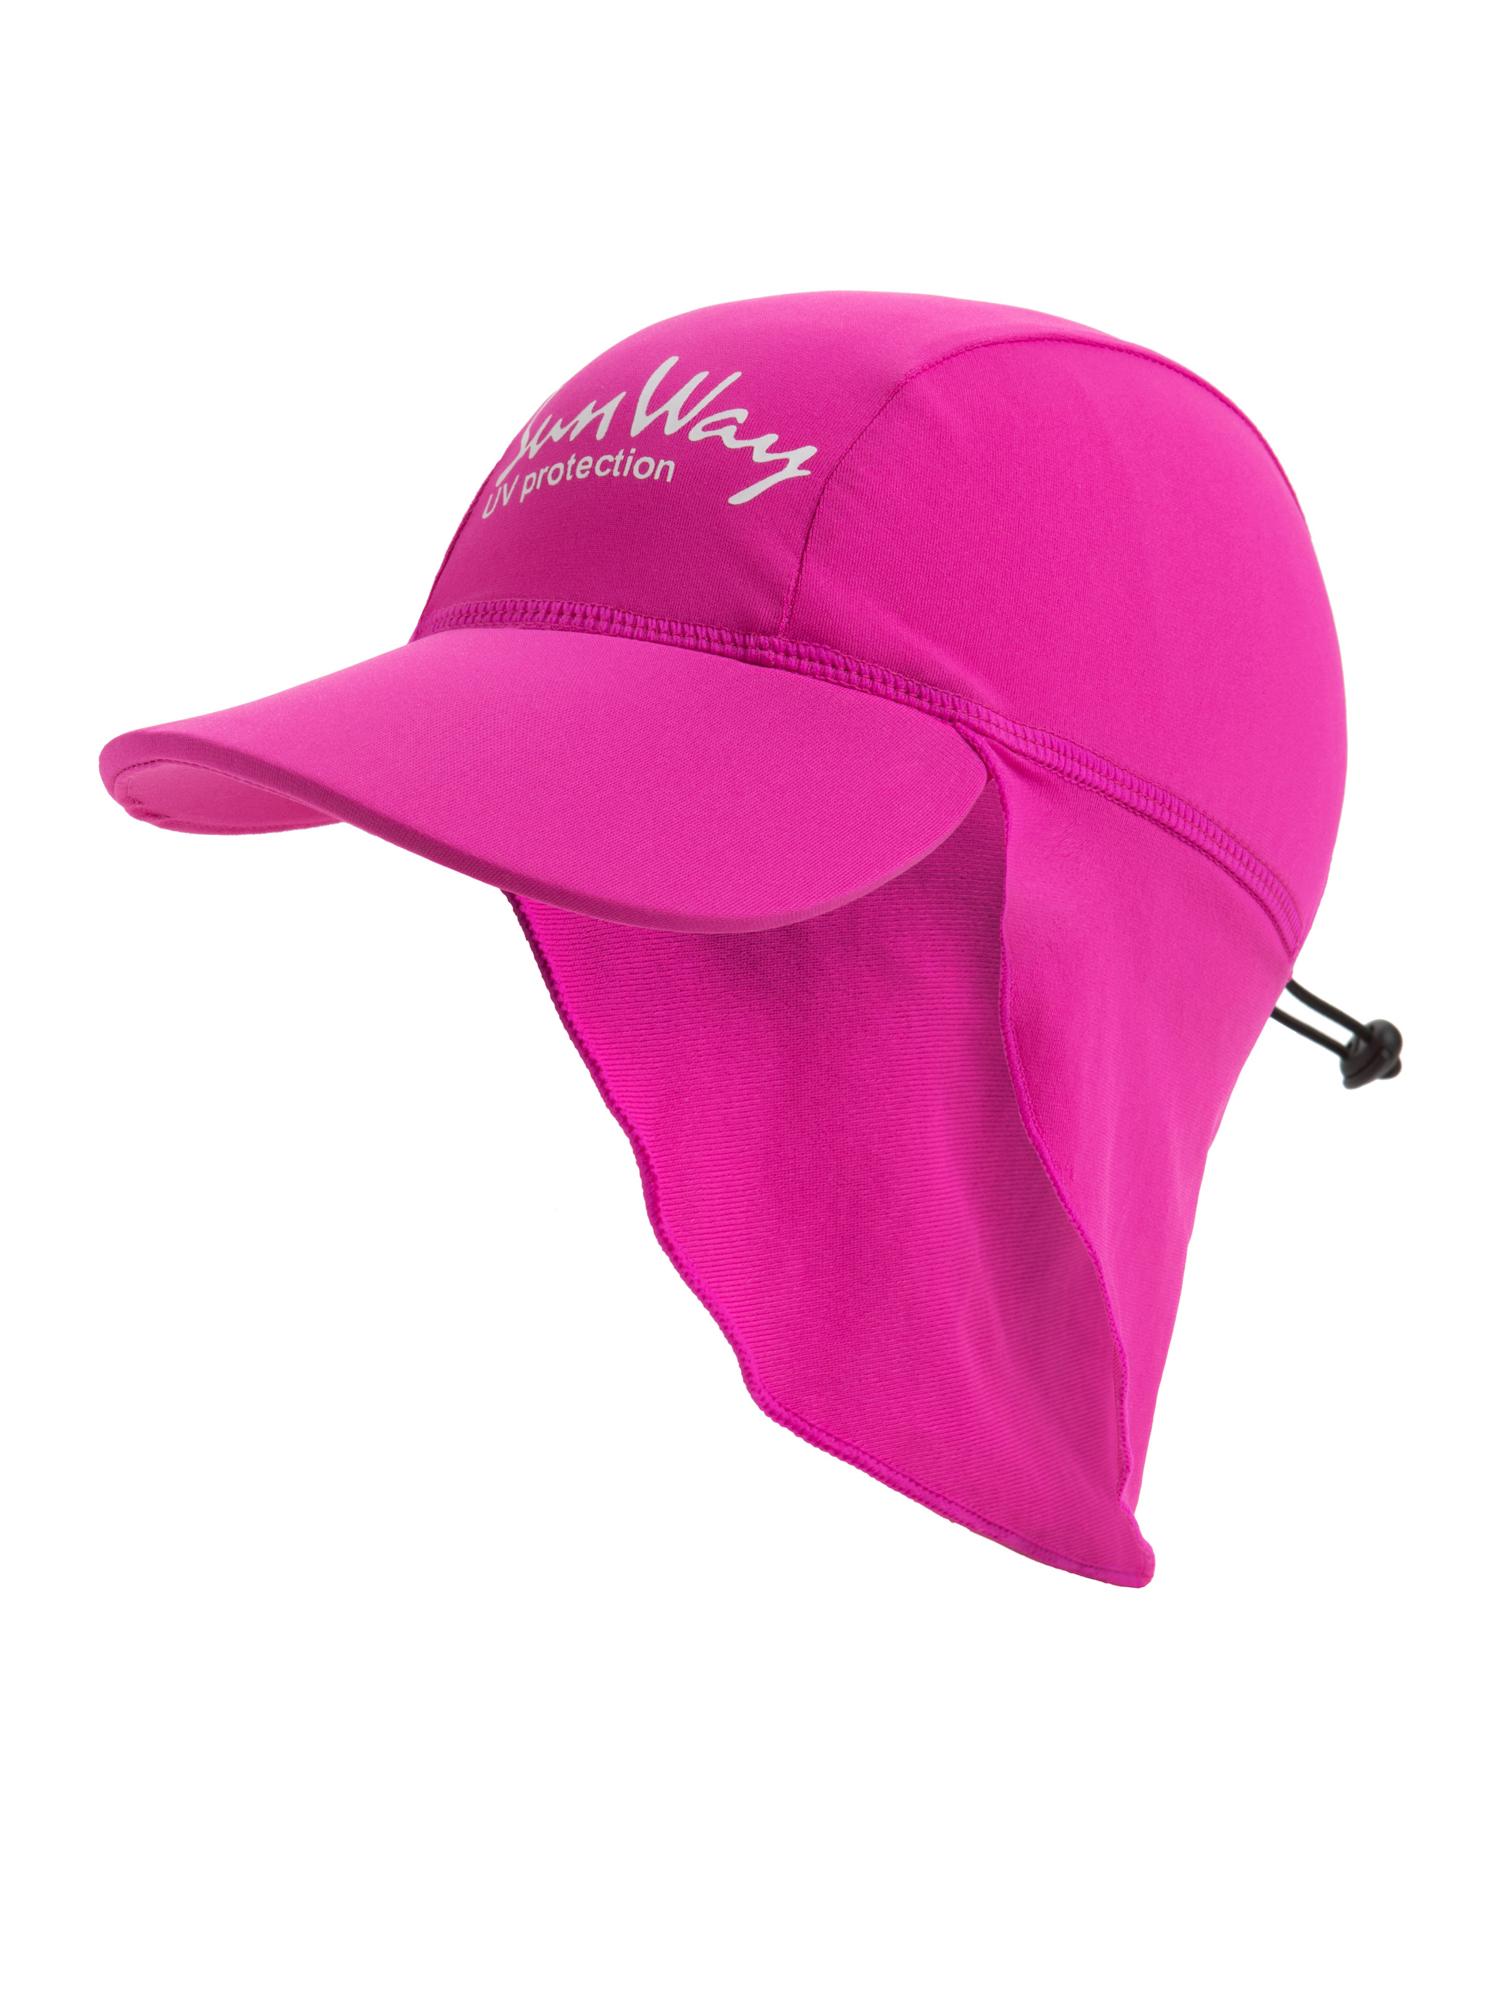 SunWay s UV Protective Hats  Pink Legionnaire Hat c3e95eb4b67